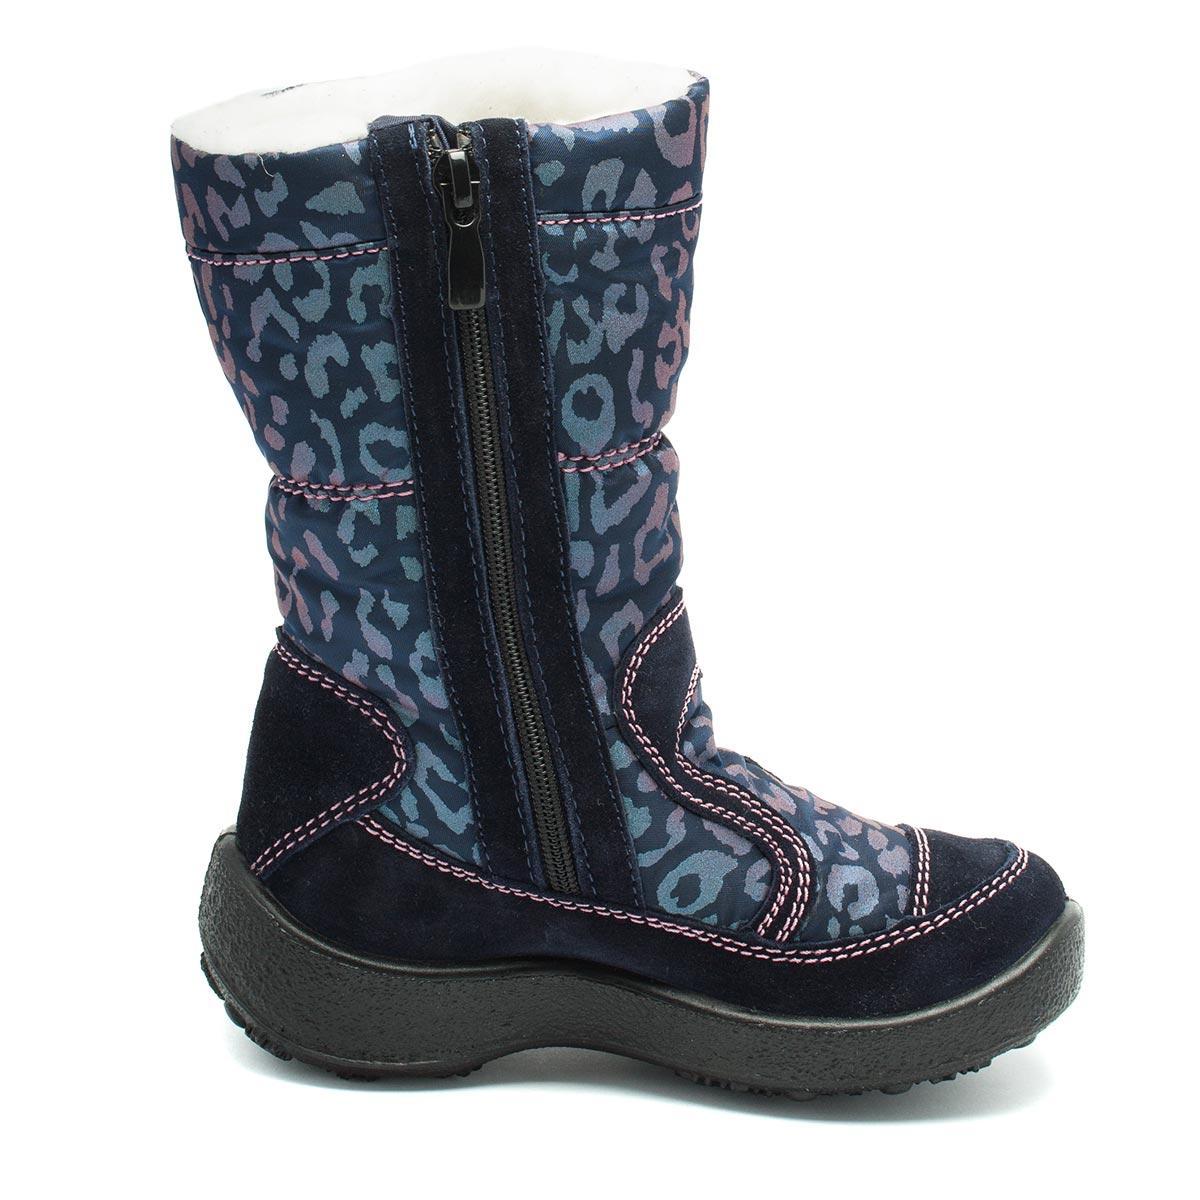 d0bb3d87b Мембранные ботинки Kapika, зимние, для девочки, размер 24-26